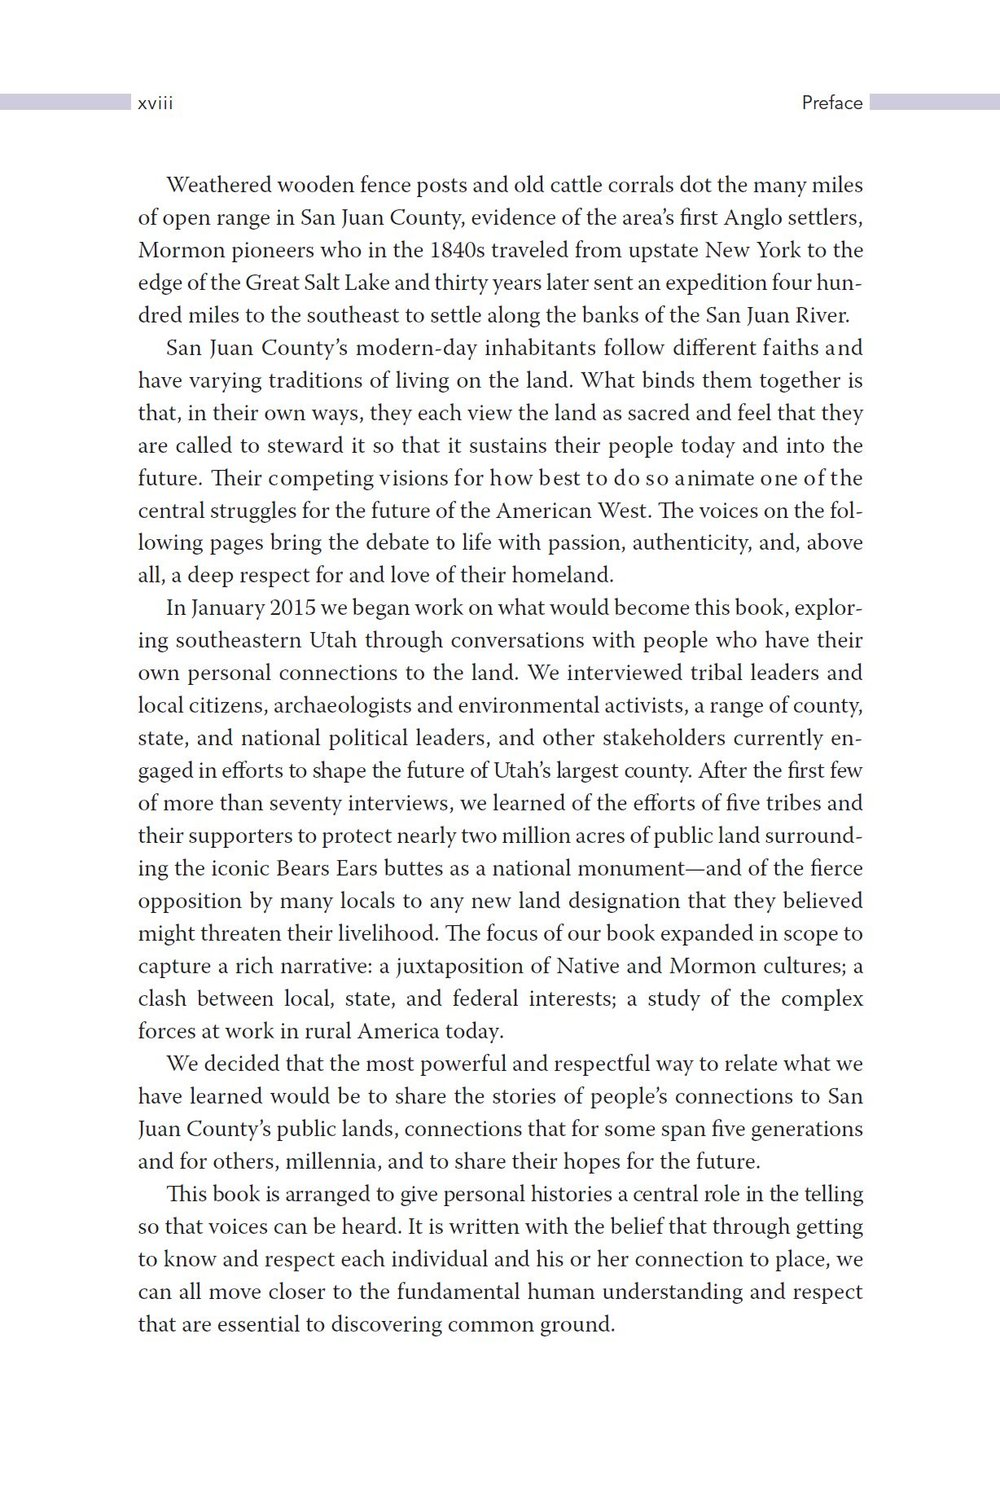 Preface p2.jpg